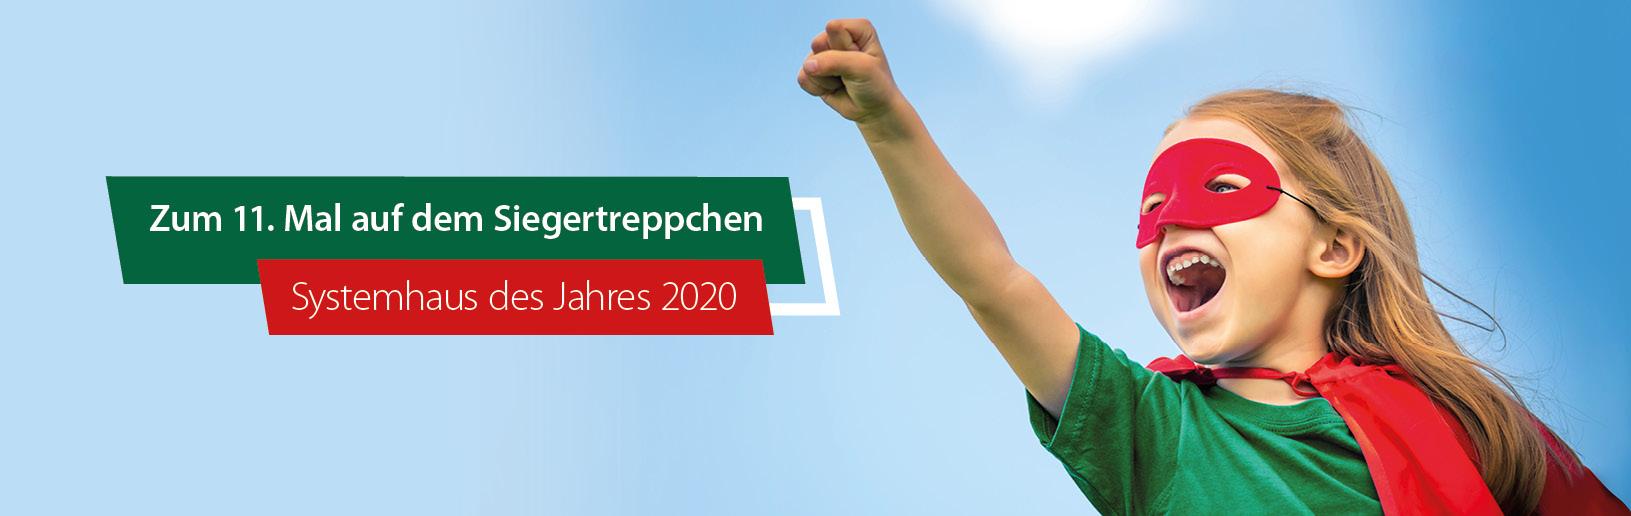 Bestes Systemhaus 2020